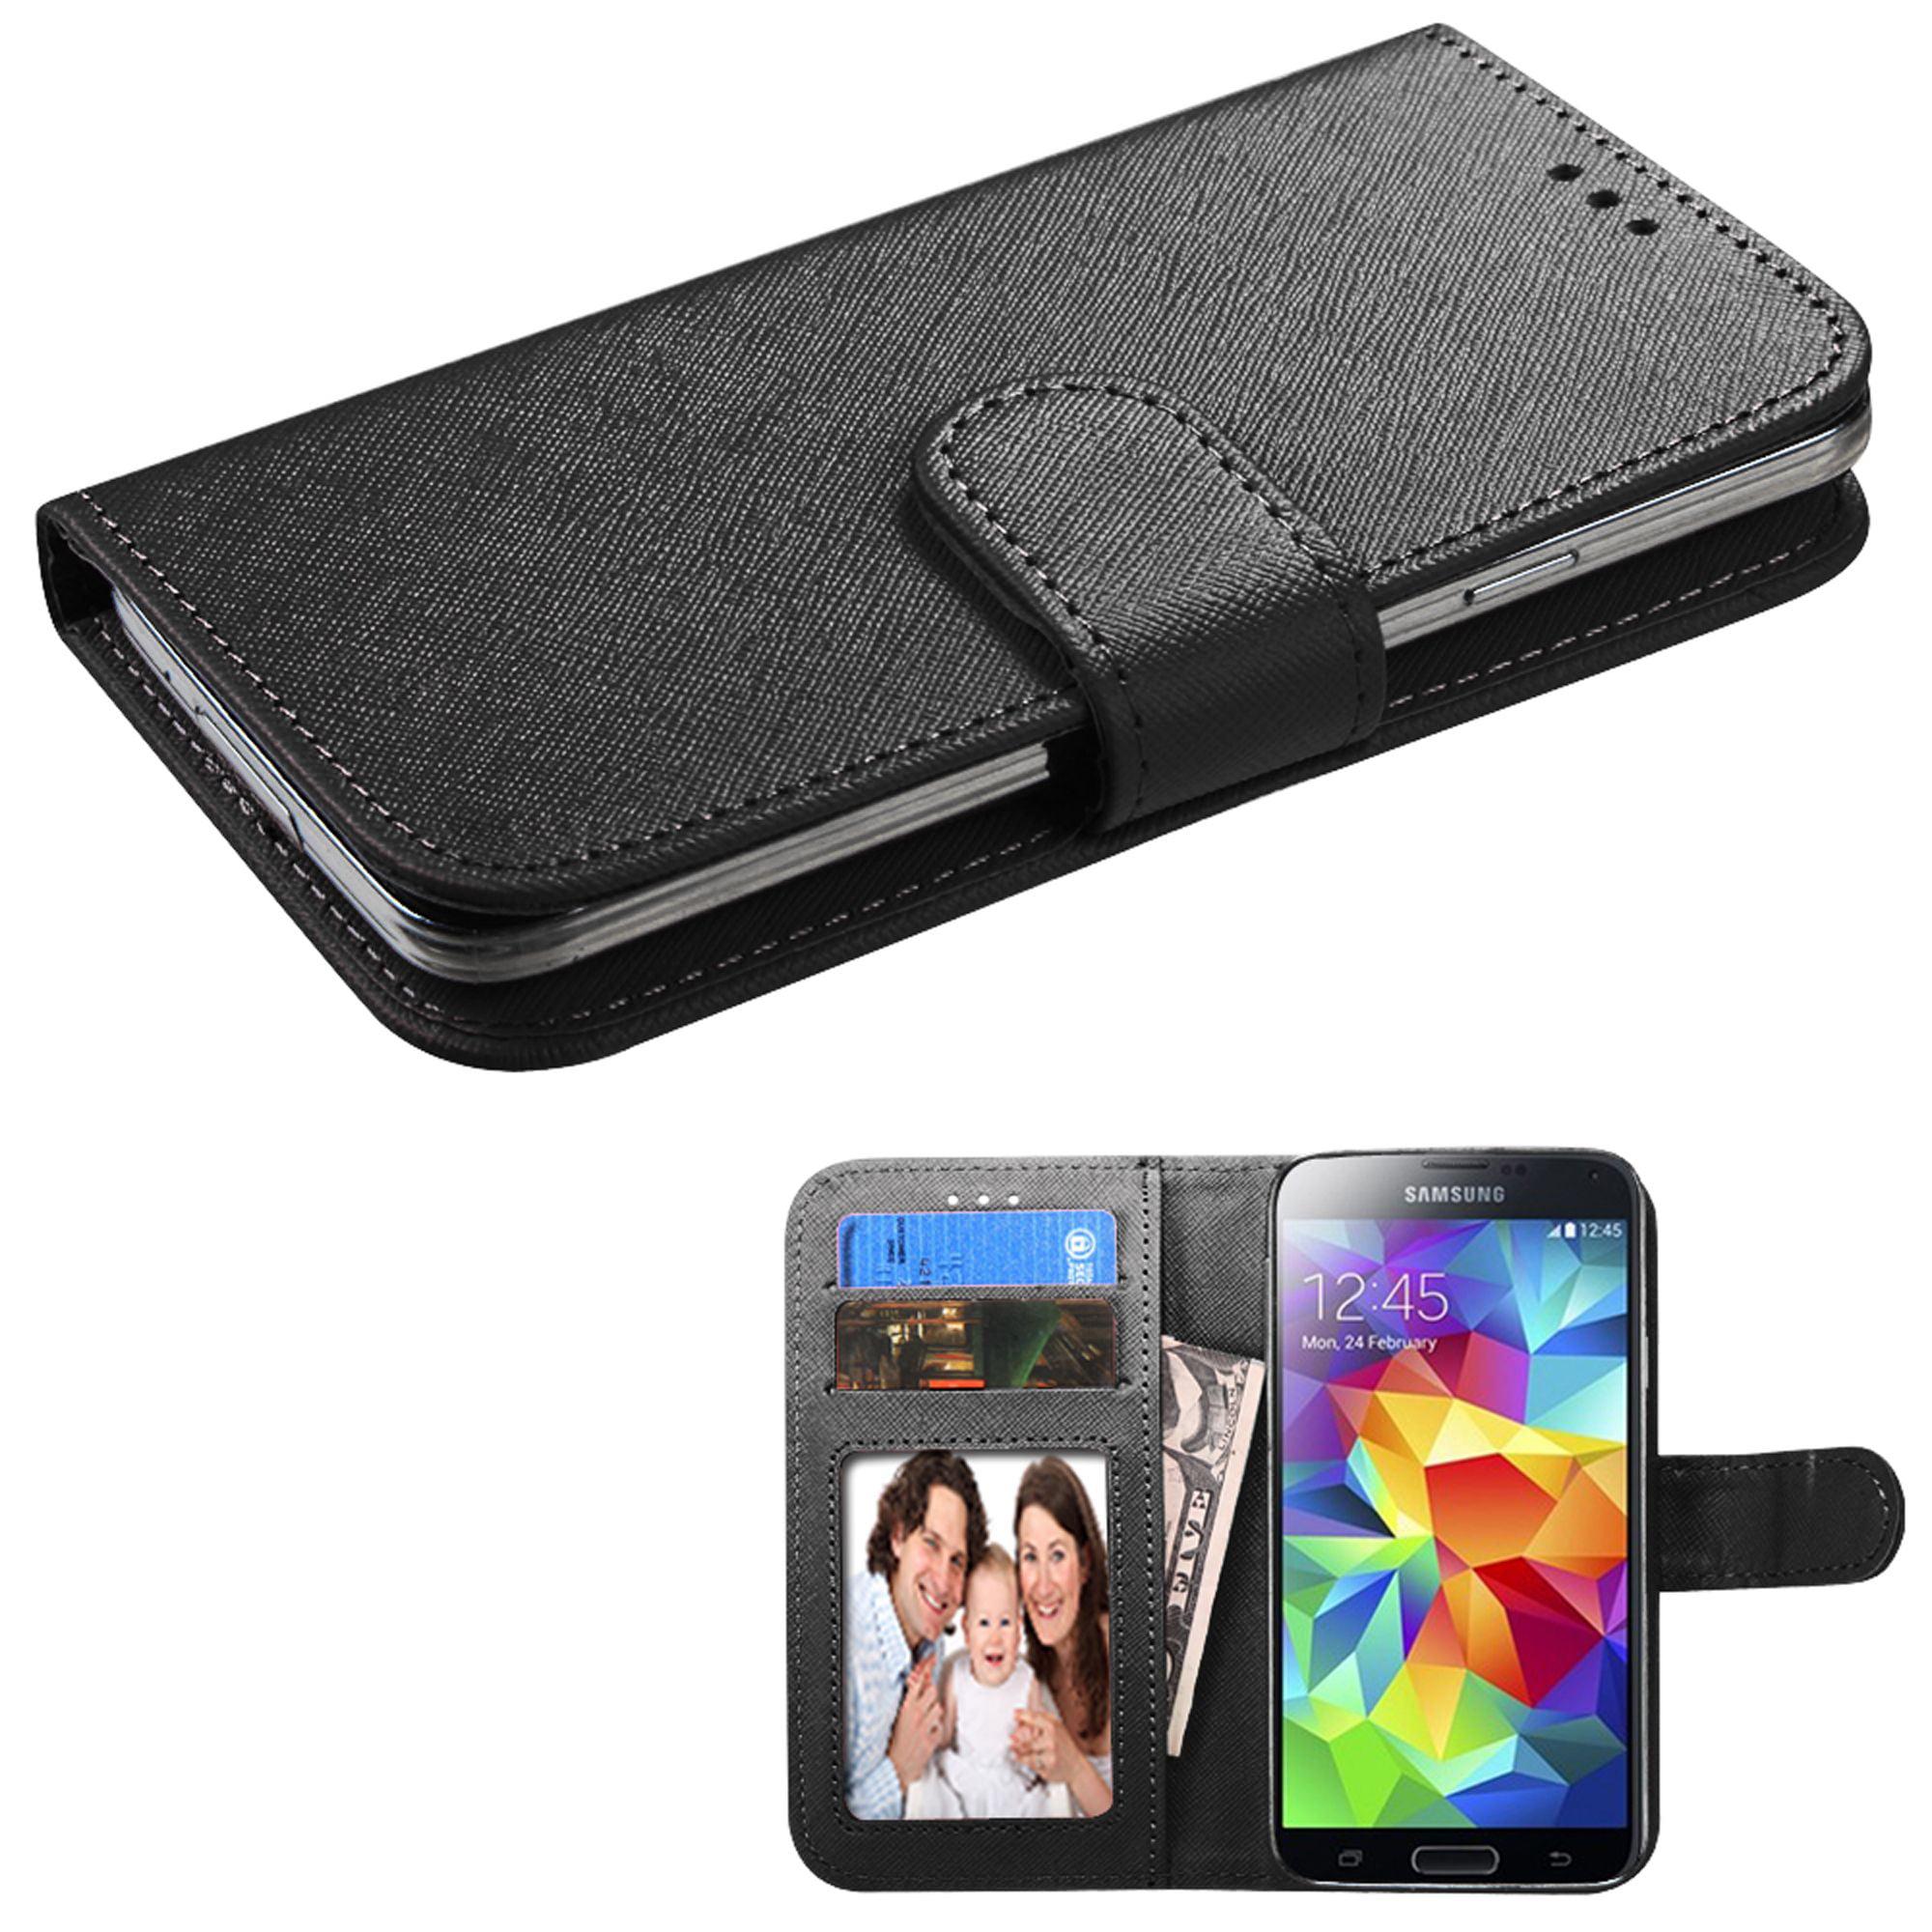 Insten Black Leather Wallet Case For iPhone SE 5 5C 5S iPod Touch 6th 5th Generation Samsung J7 Sky Pro J3 Luna Pro ZTE Maven Overture Fanfare LG Stylo 3 Optimus Zone 3 2 Universal